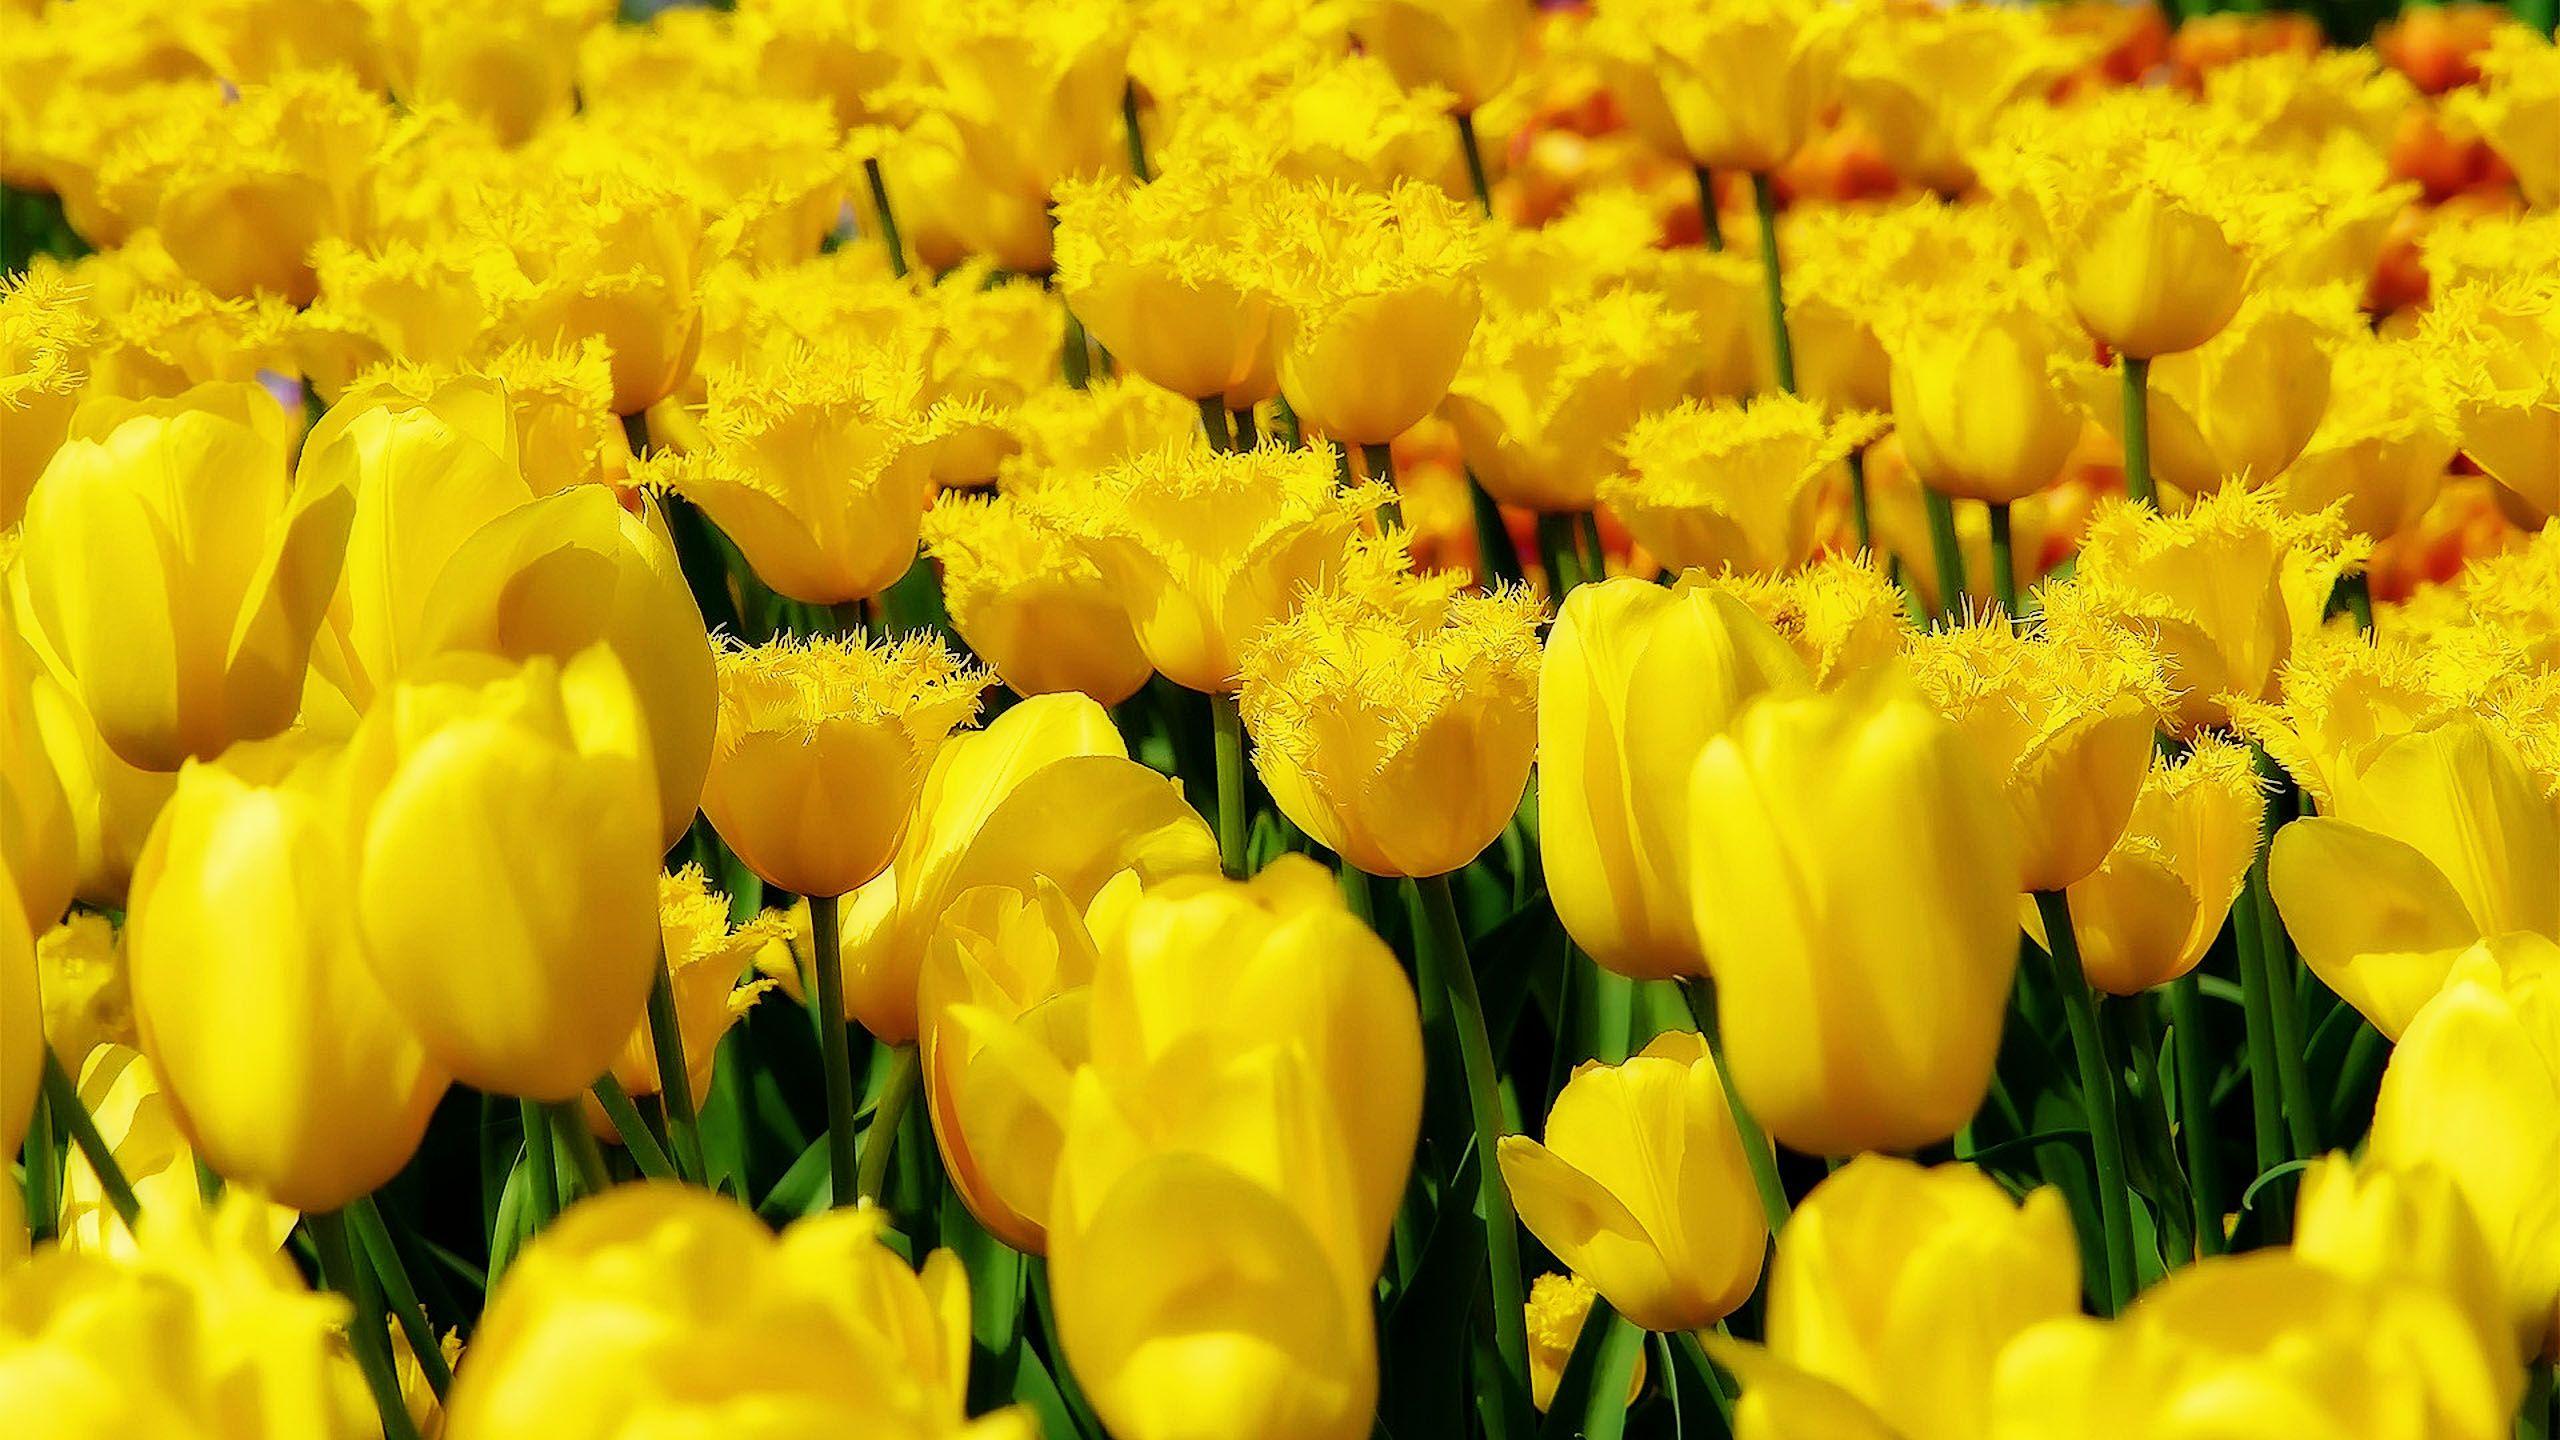 Yellow Tulips Field Http 1080wallpaper Net Yellow Tulips Field Html